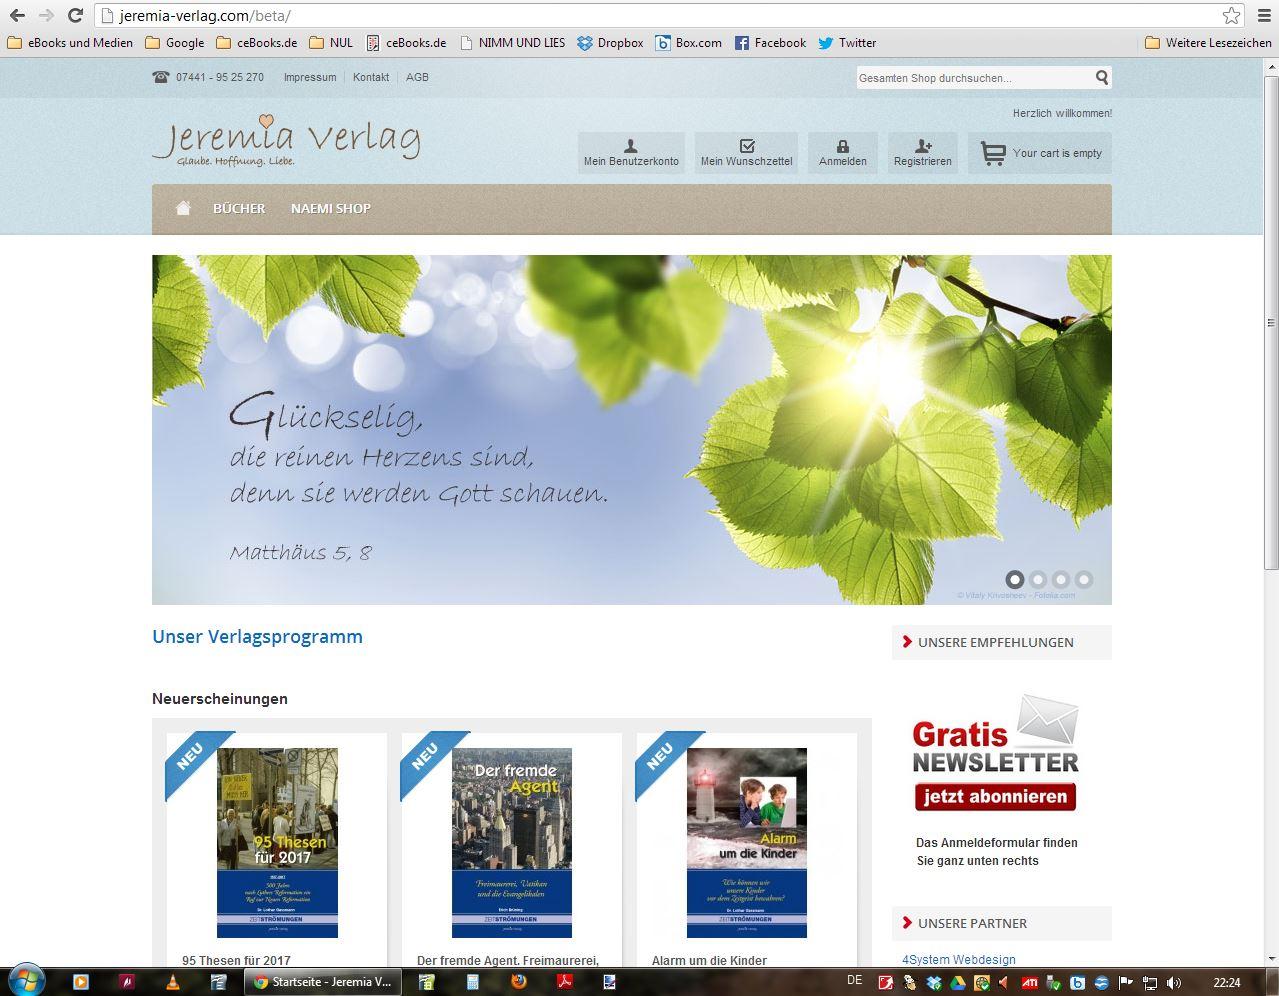 Jeremia-Verlag